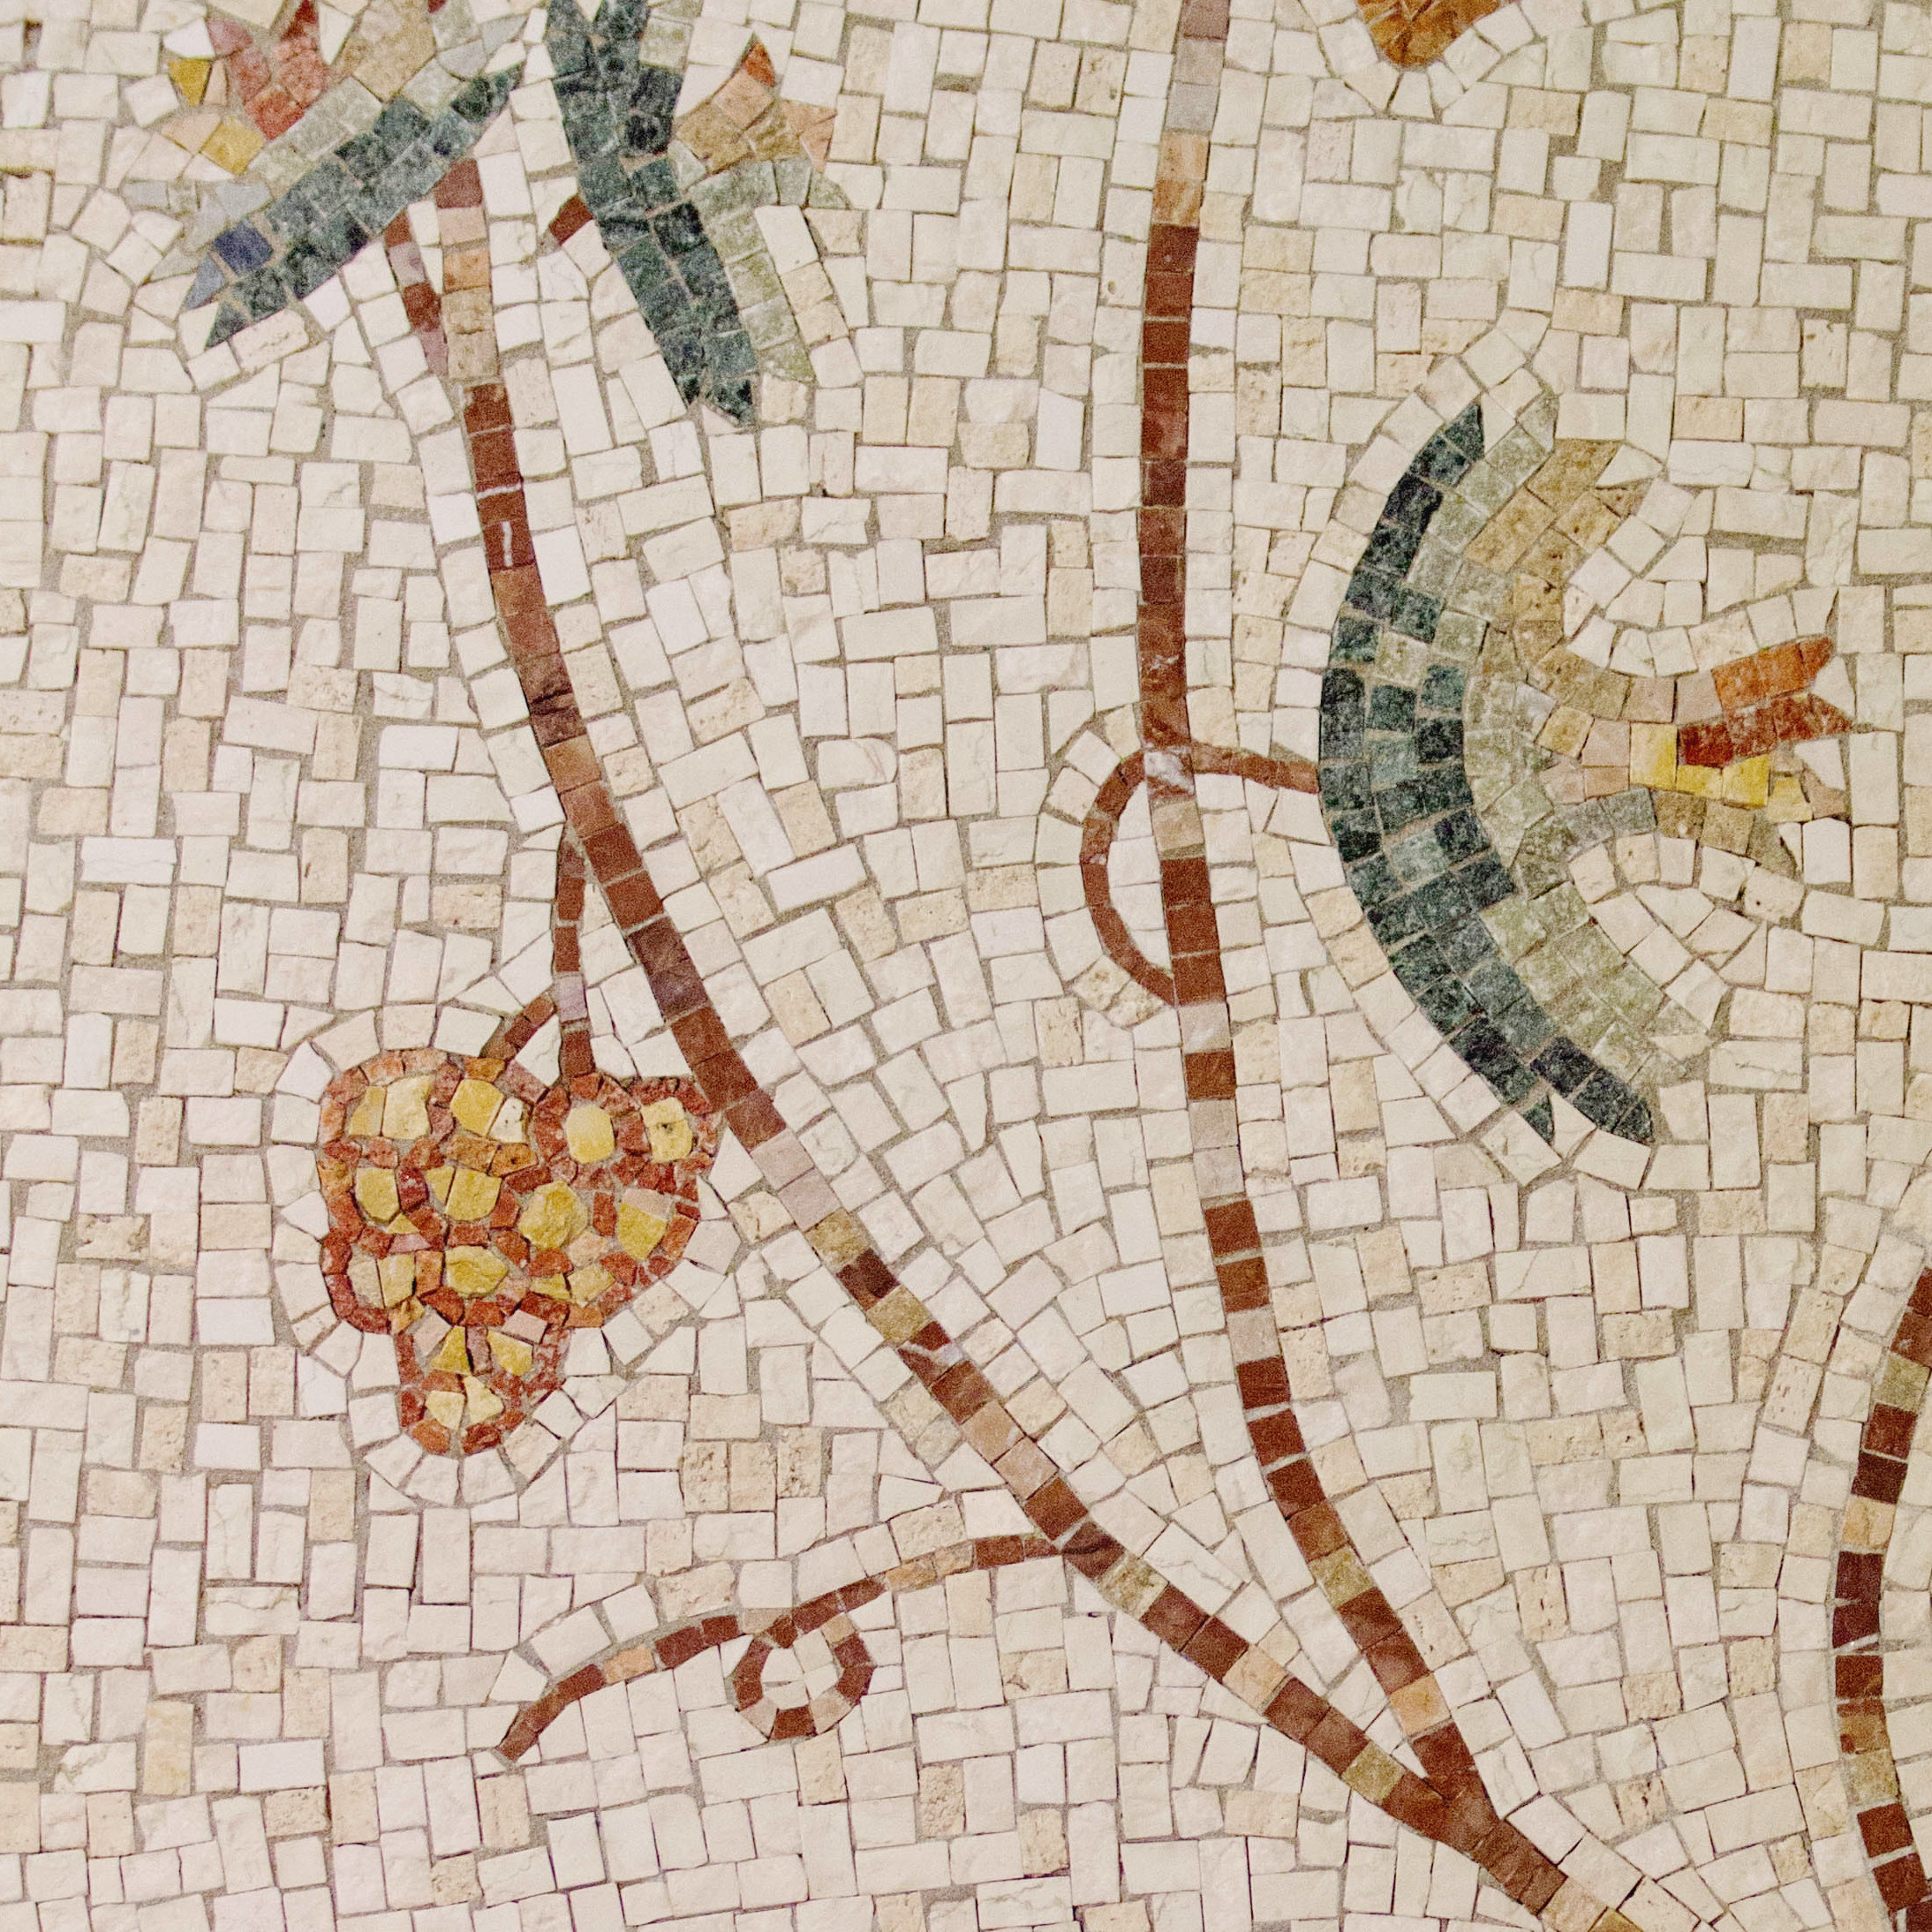 mosaic-6 copy.jpg